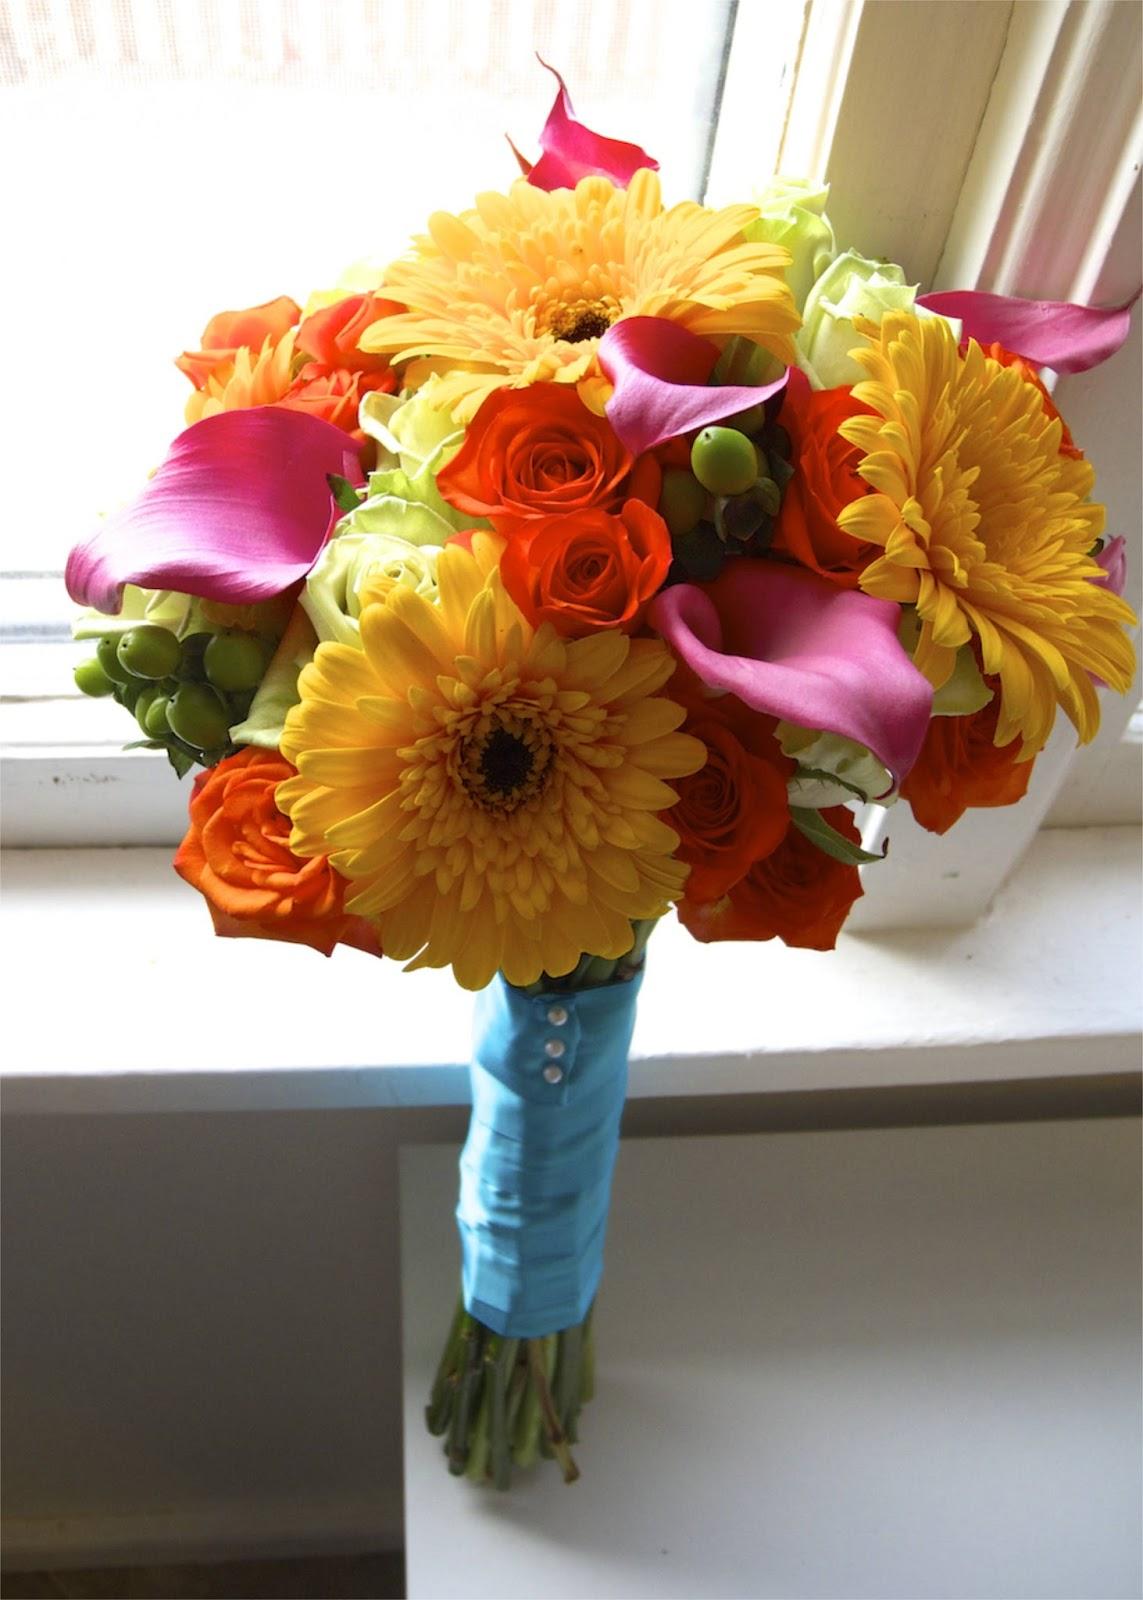 The flower girl blog bright summer wedding flowers for Bright wedding bouquet